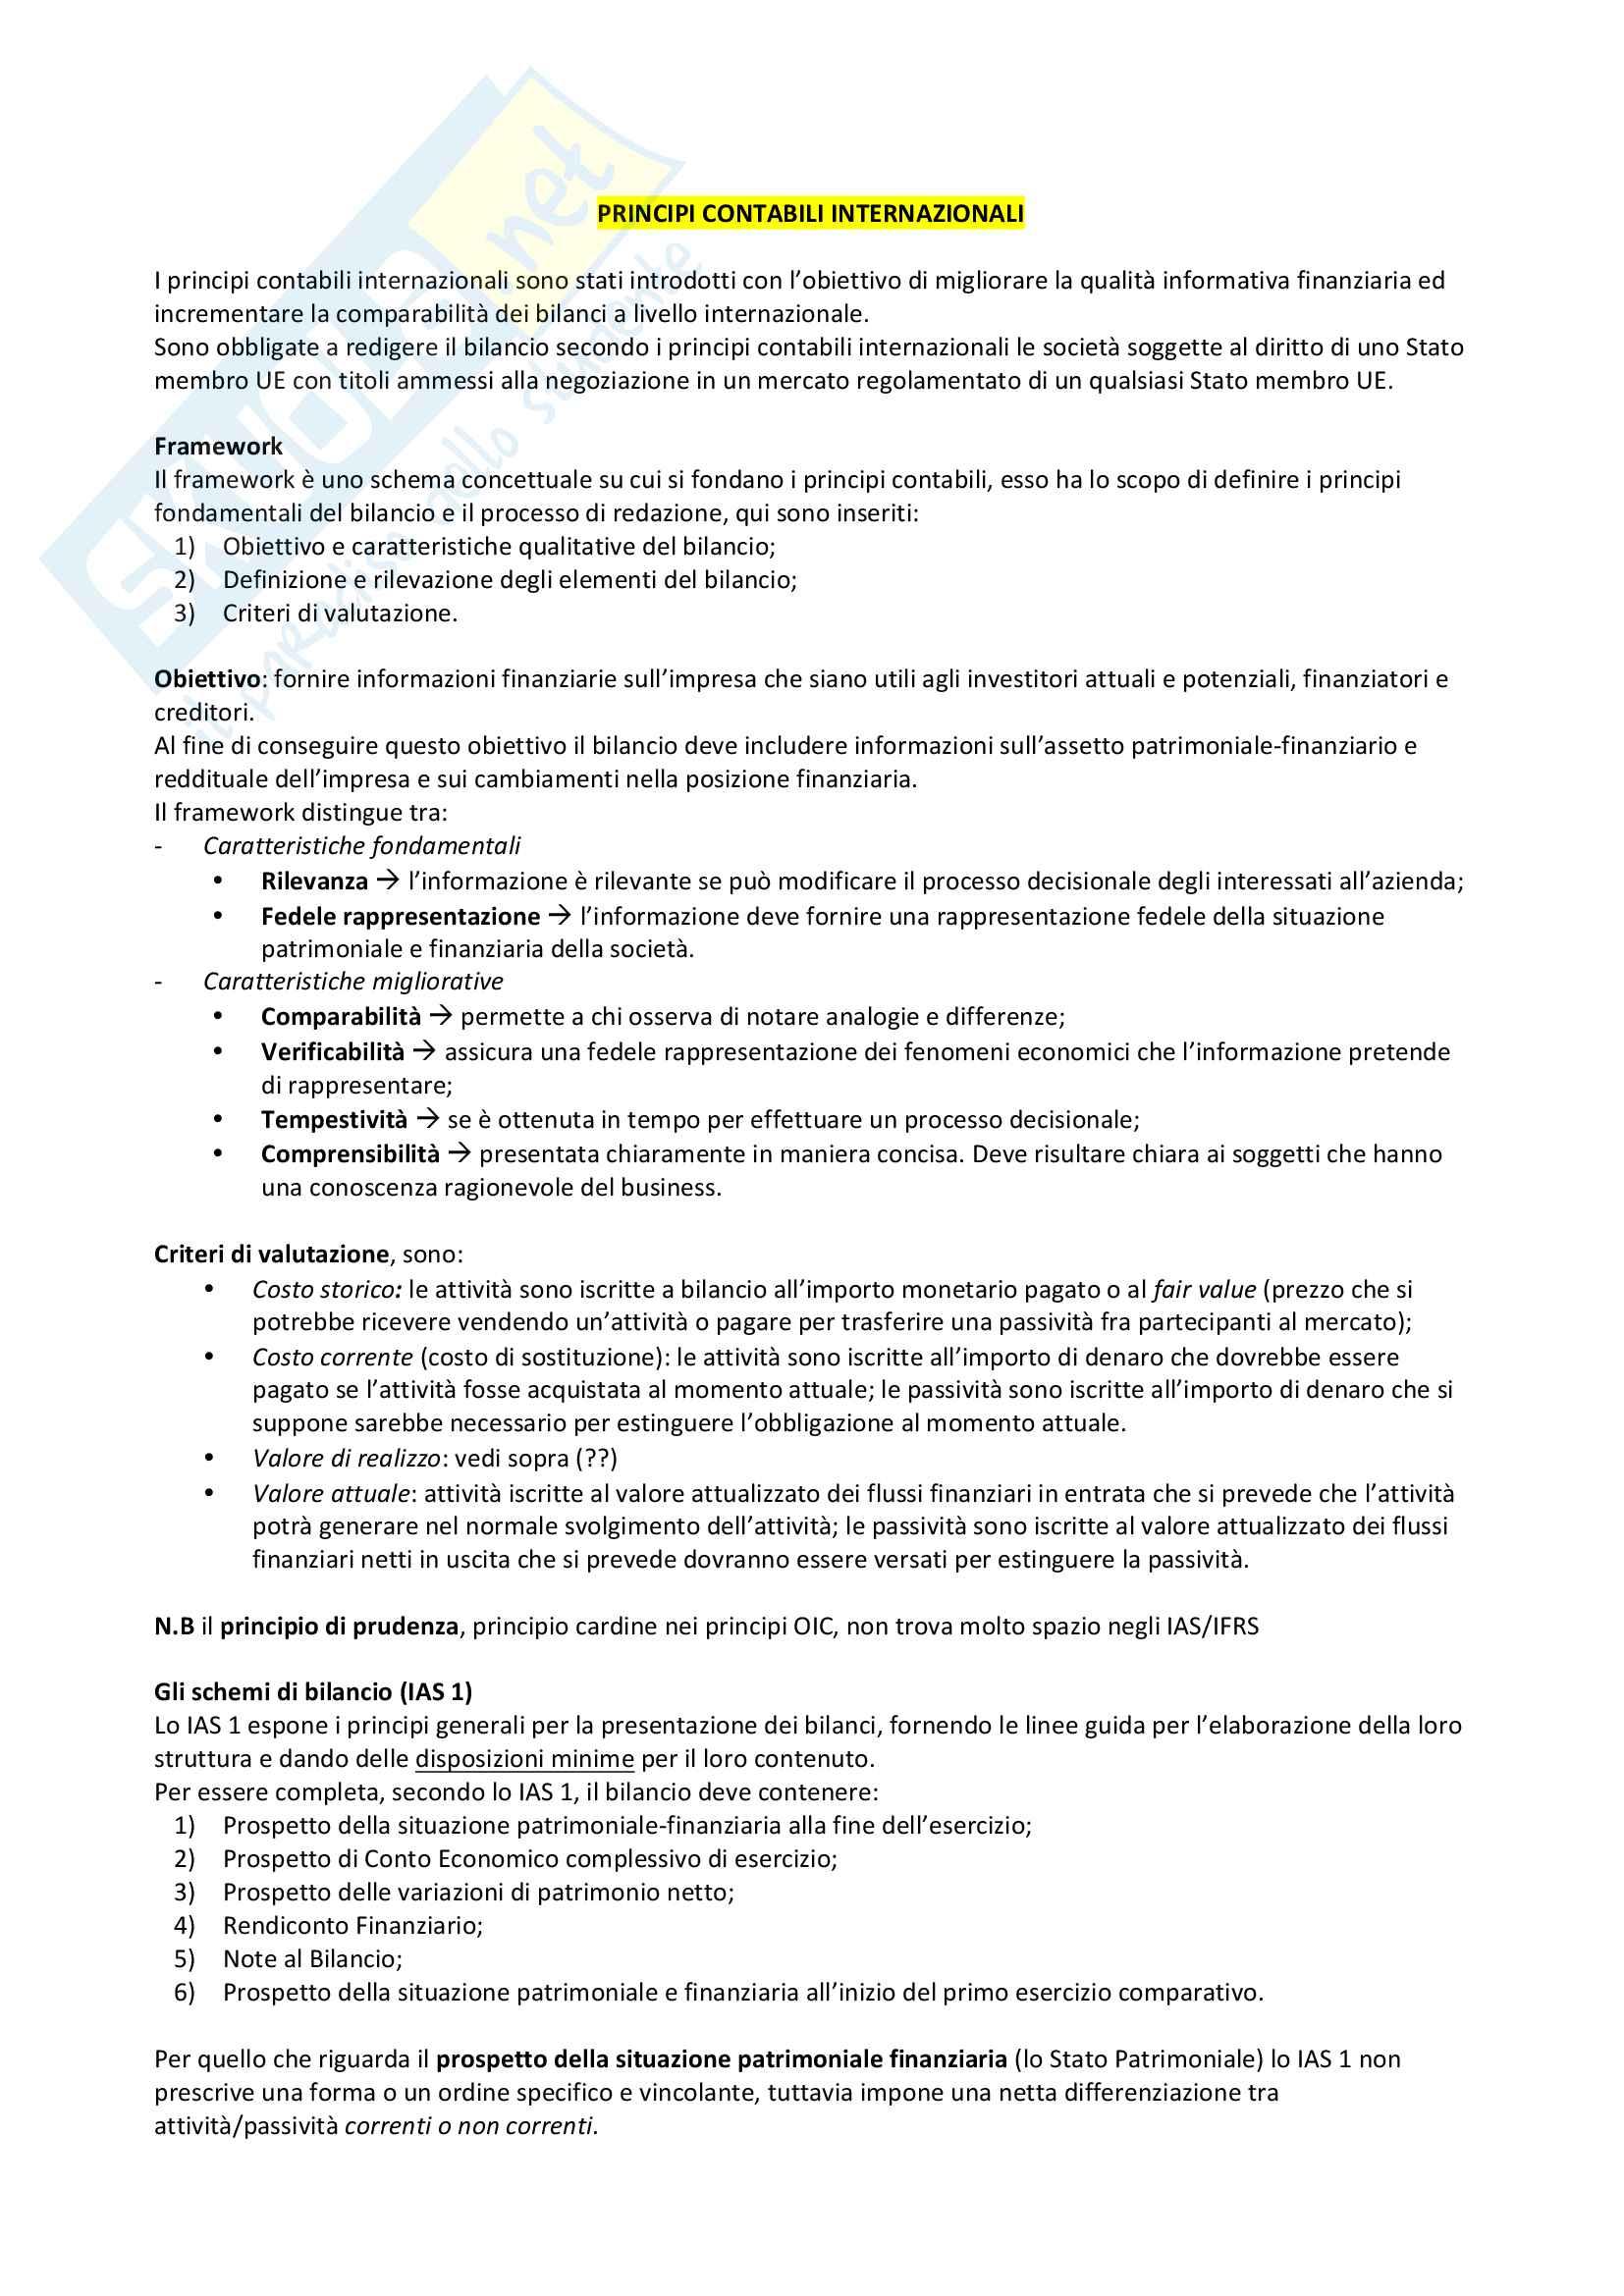 IAS/IFRS I principi contabili intenazionali